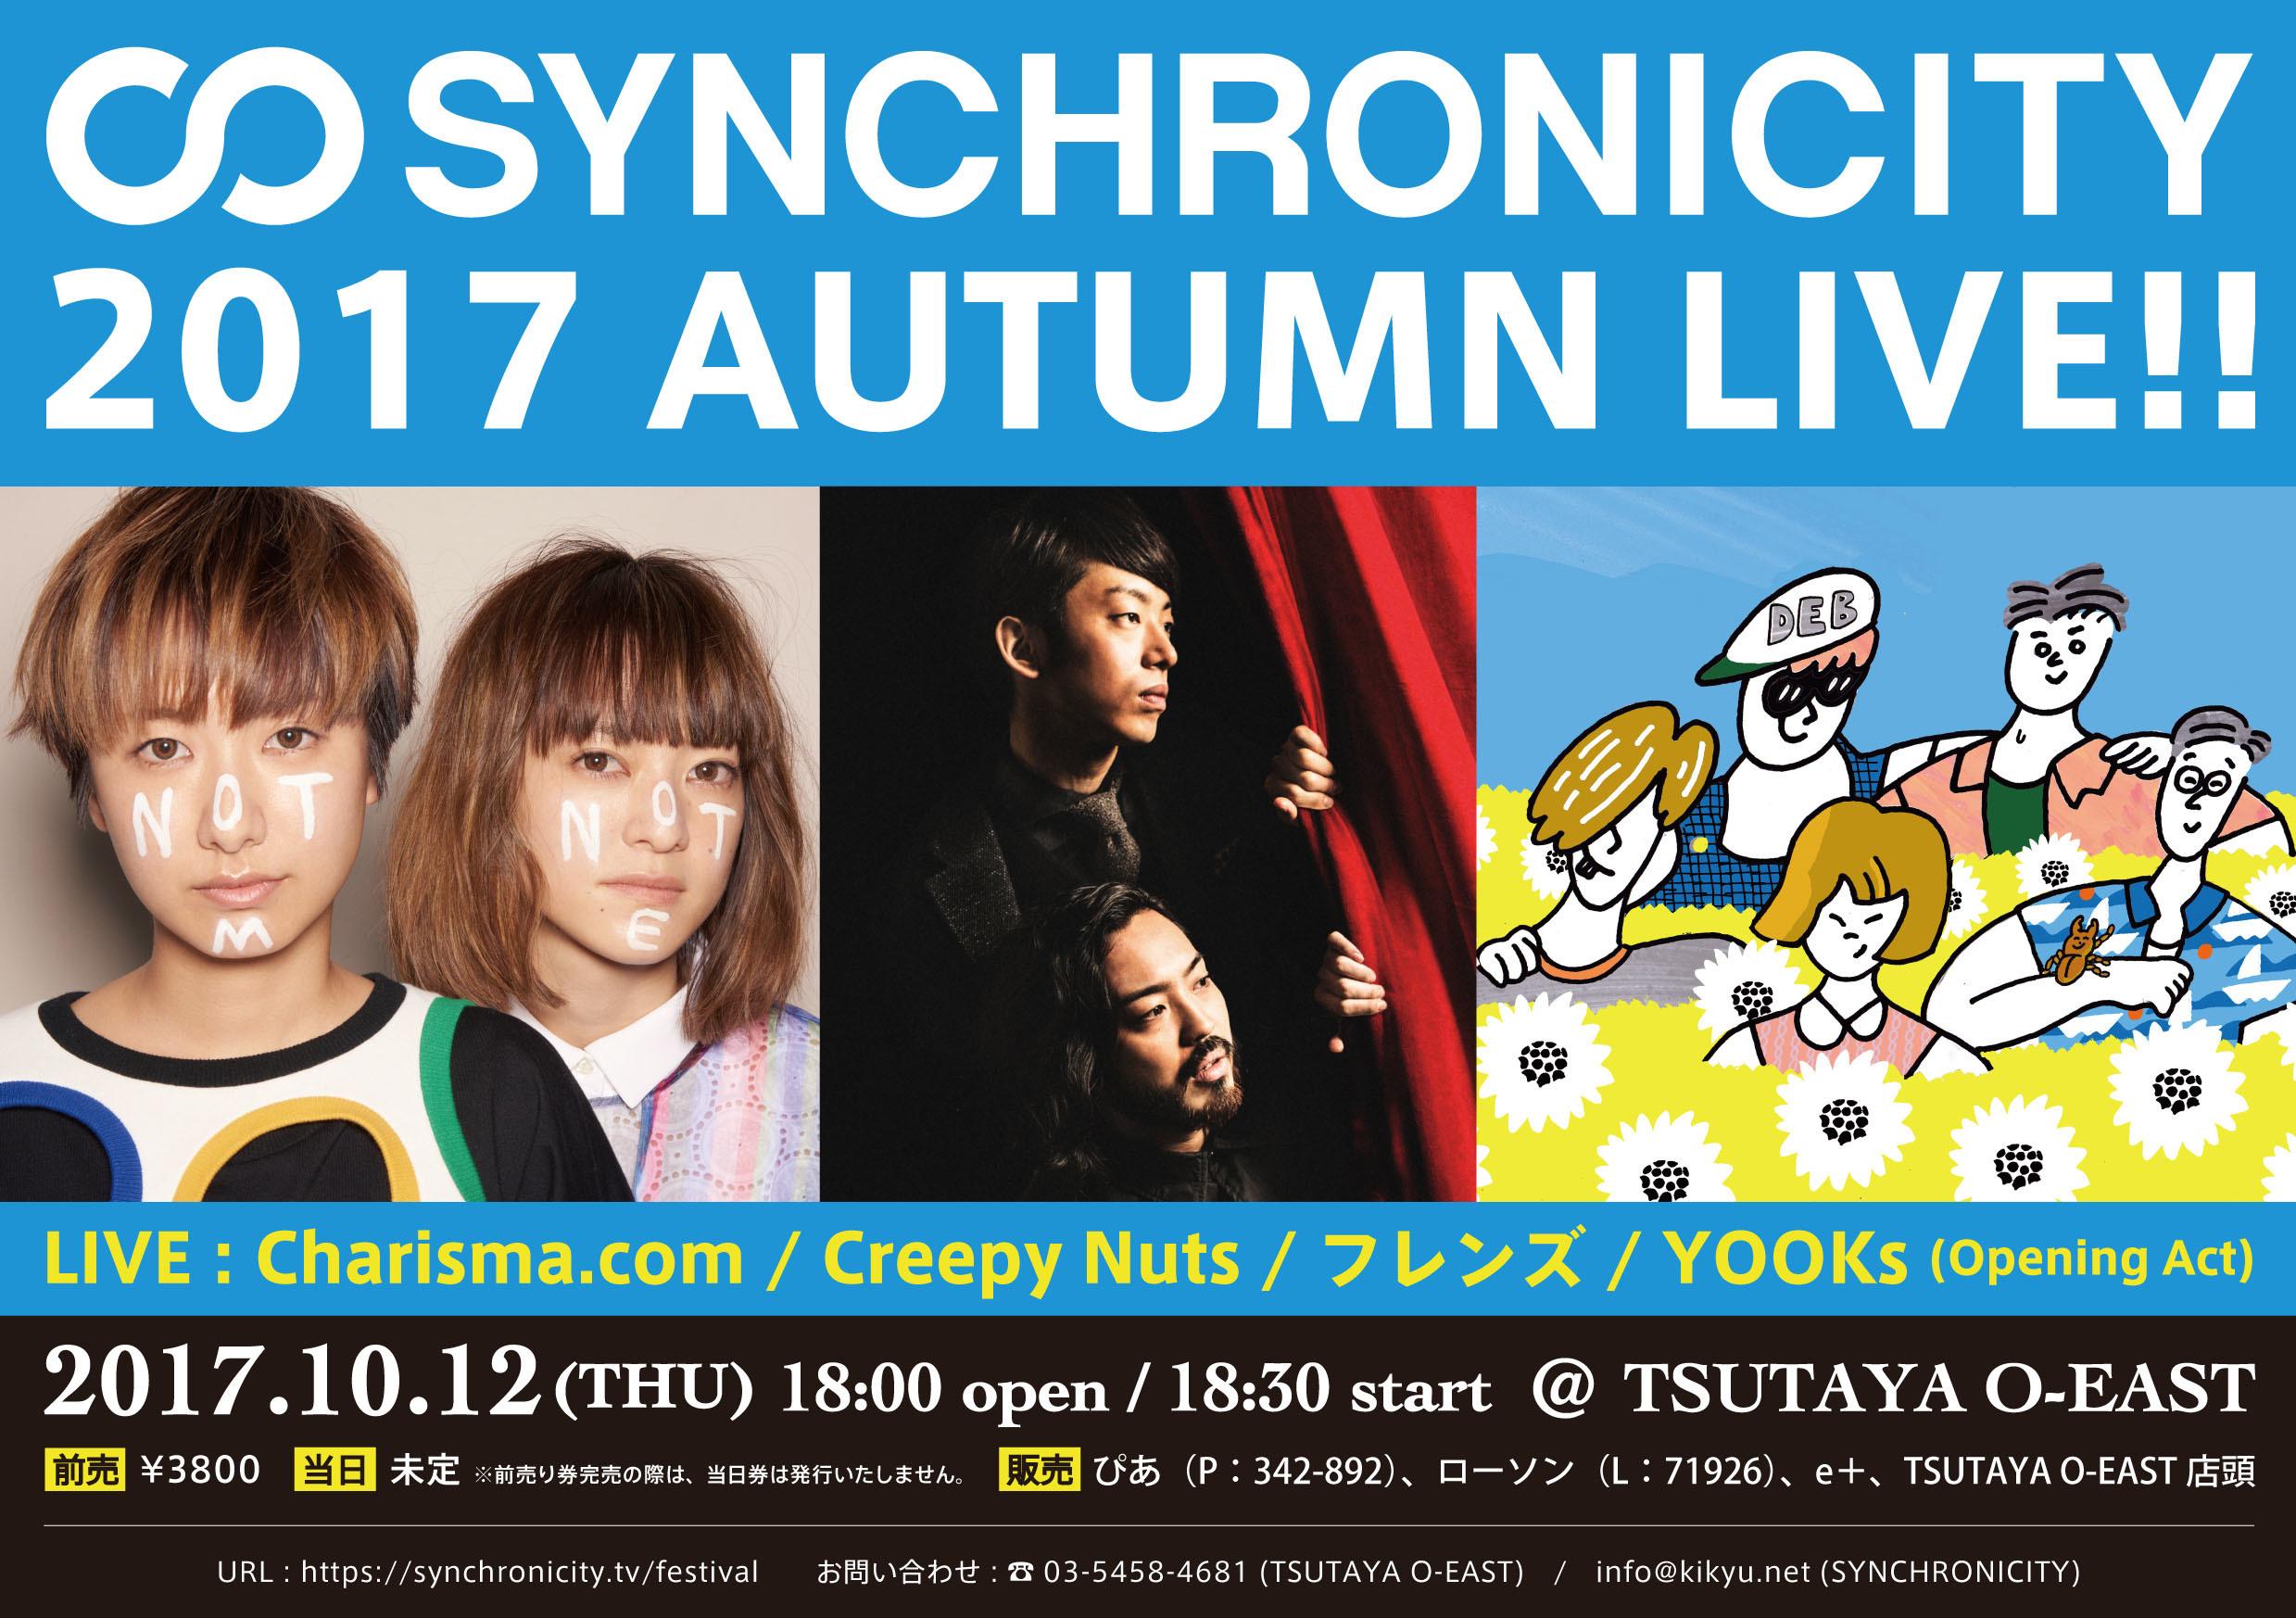 SYNCHRONICITY'17 AUTUMN LIVE!!